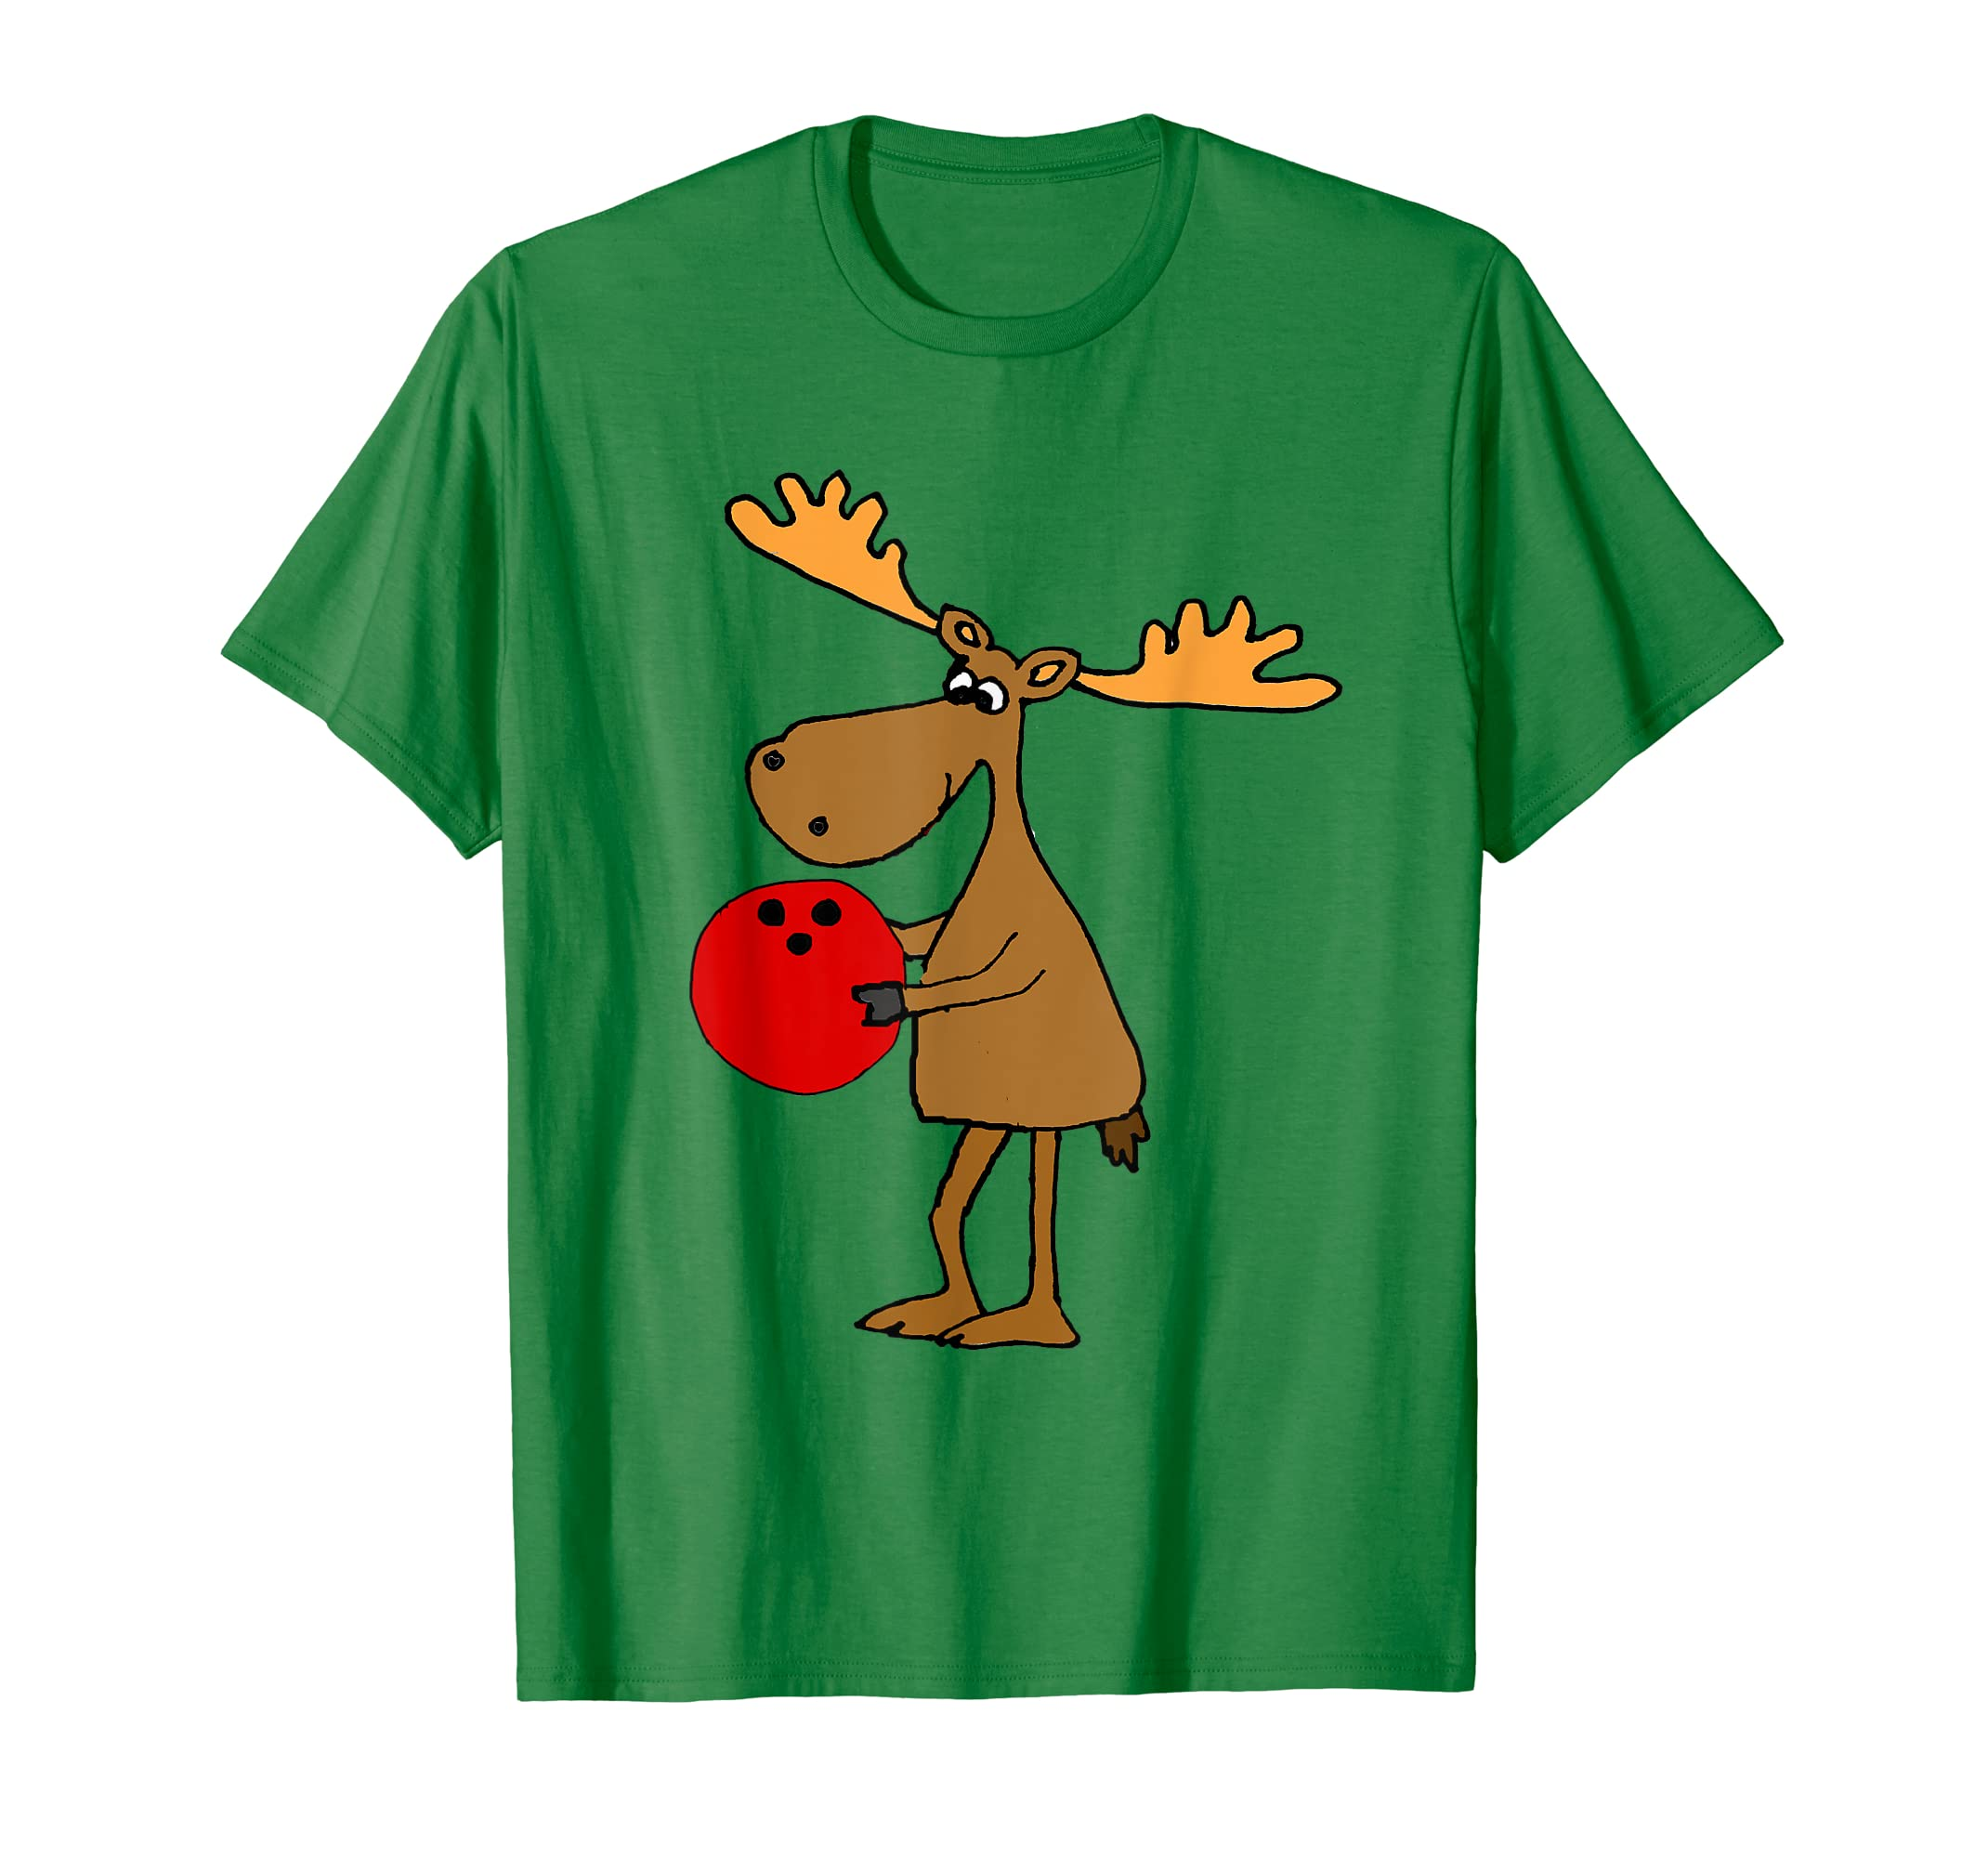 ec5b3bb8 Amazon.com: Smilealottees Funny Moose Bowling Cartoon T-shirt: Clothing